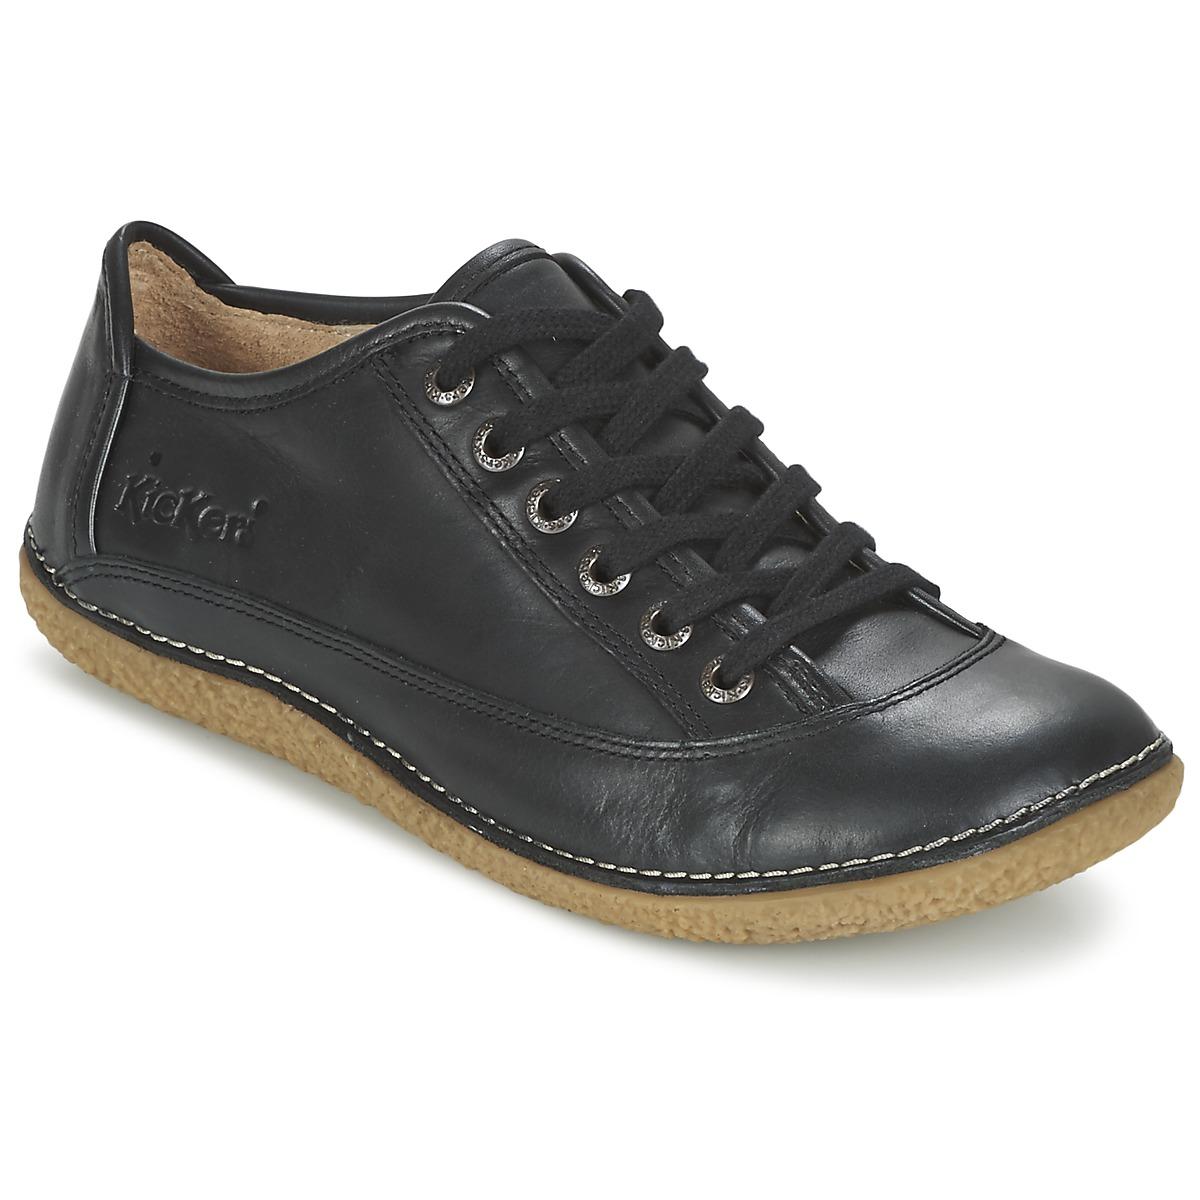 kickers hollyday noir chaussure pas cher avec chaussures derbies femme 76 30. Black Bedroom Furniture Sets. Home Design Ideas